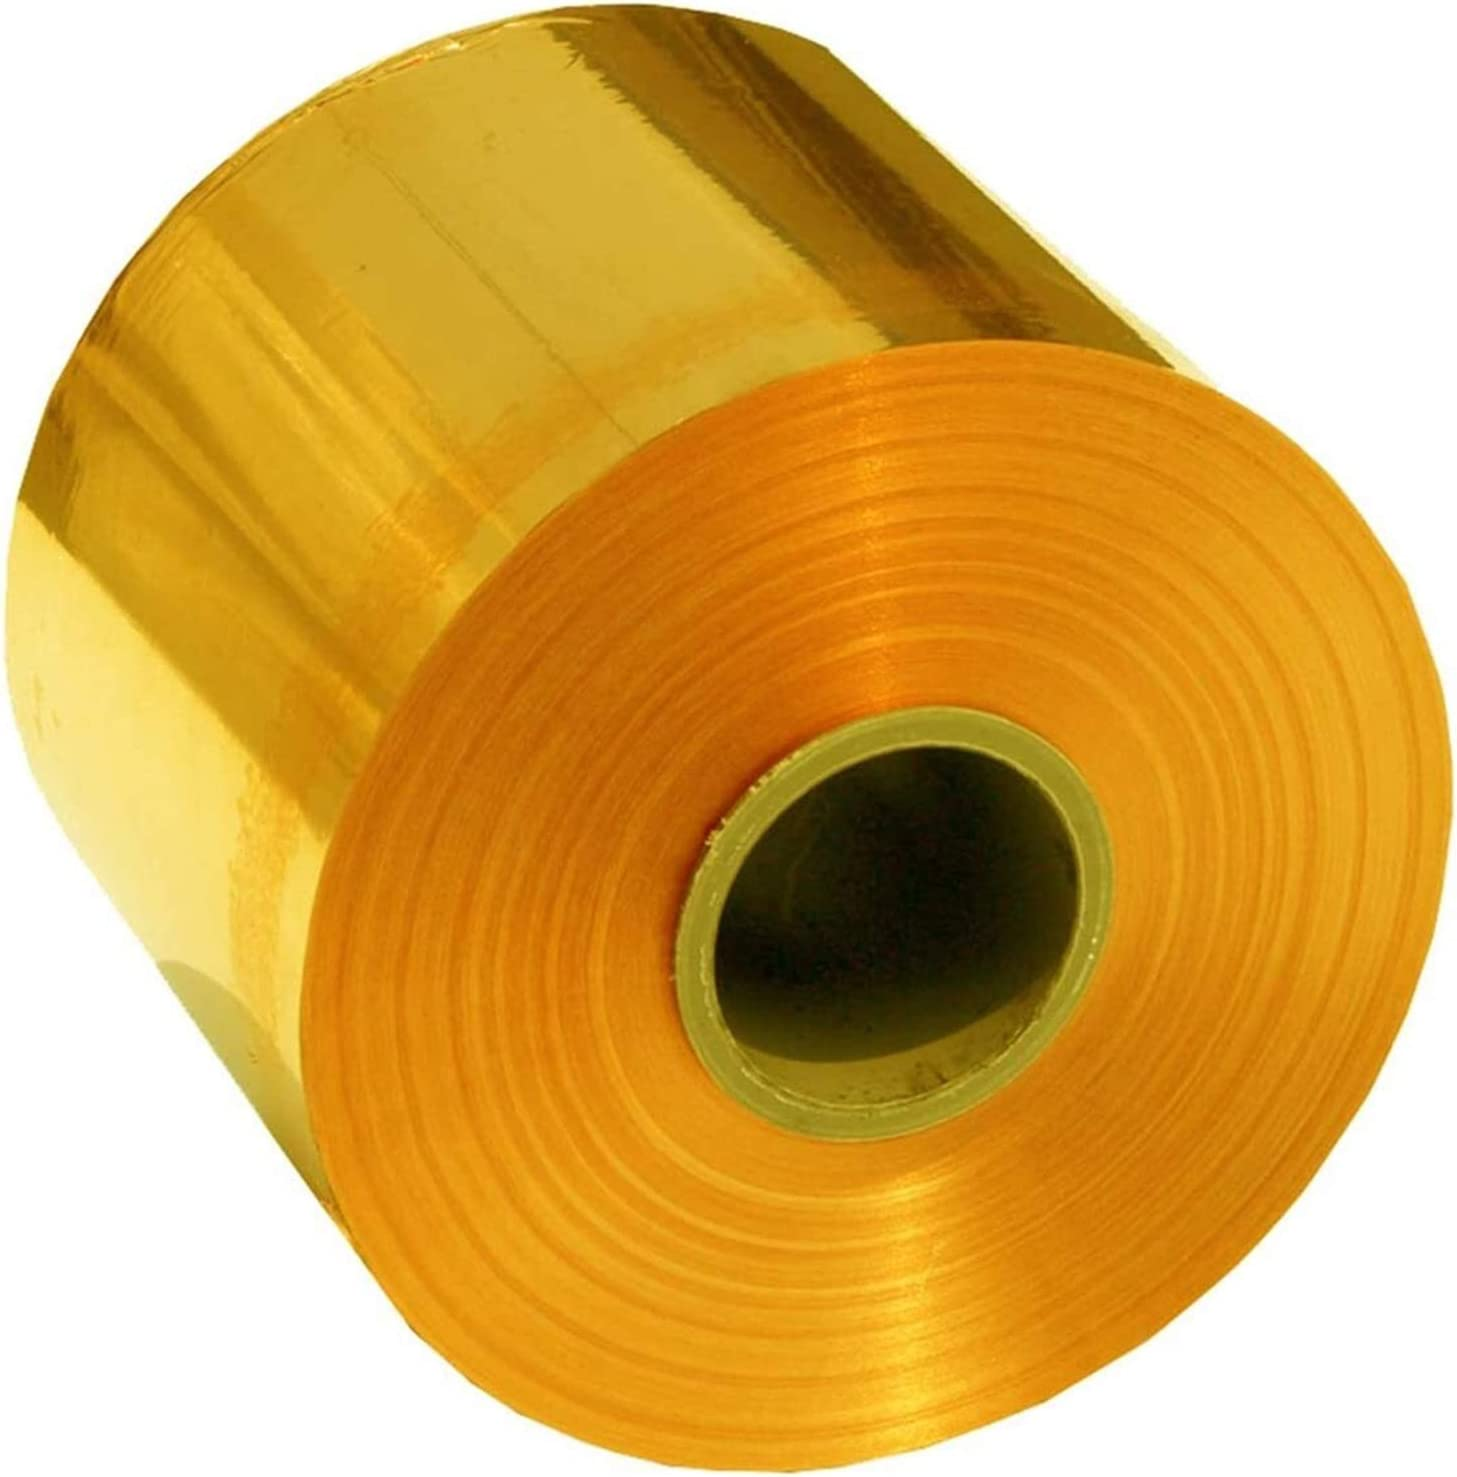 Over Columbus Mall item handling ☆ Wzqwzj Brass Metal Thin Sheet Foil Plate Pure Copp high Strength